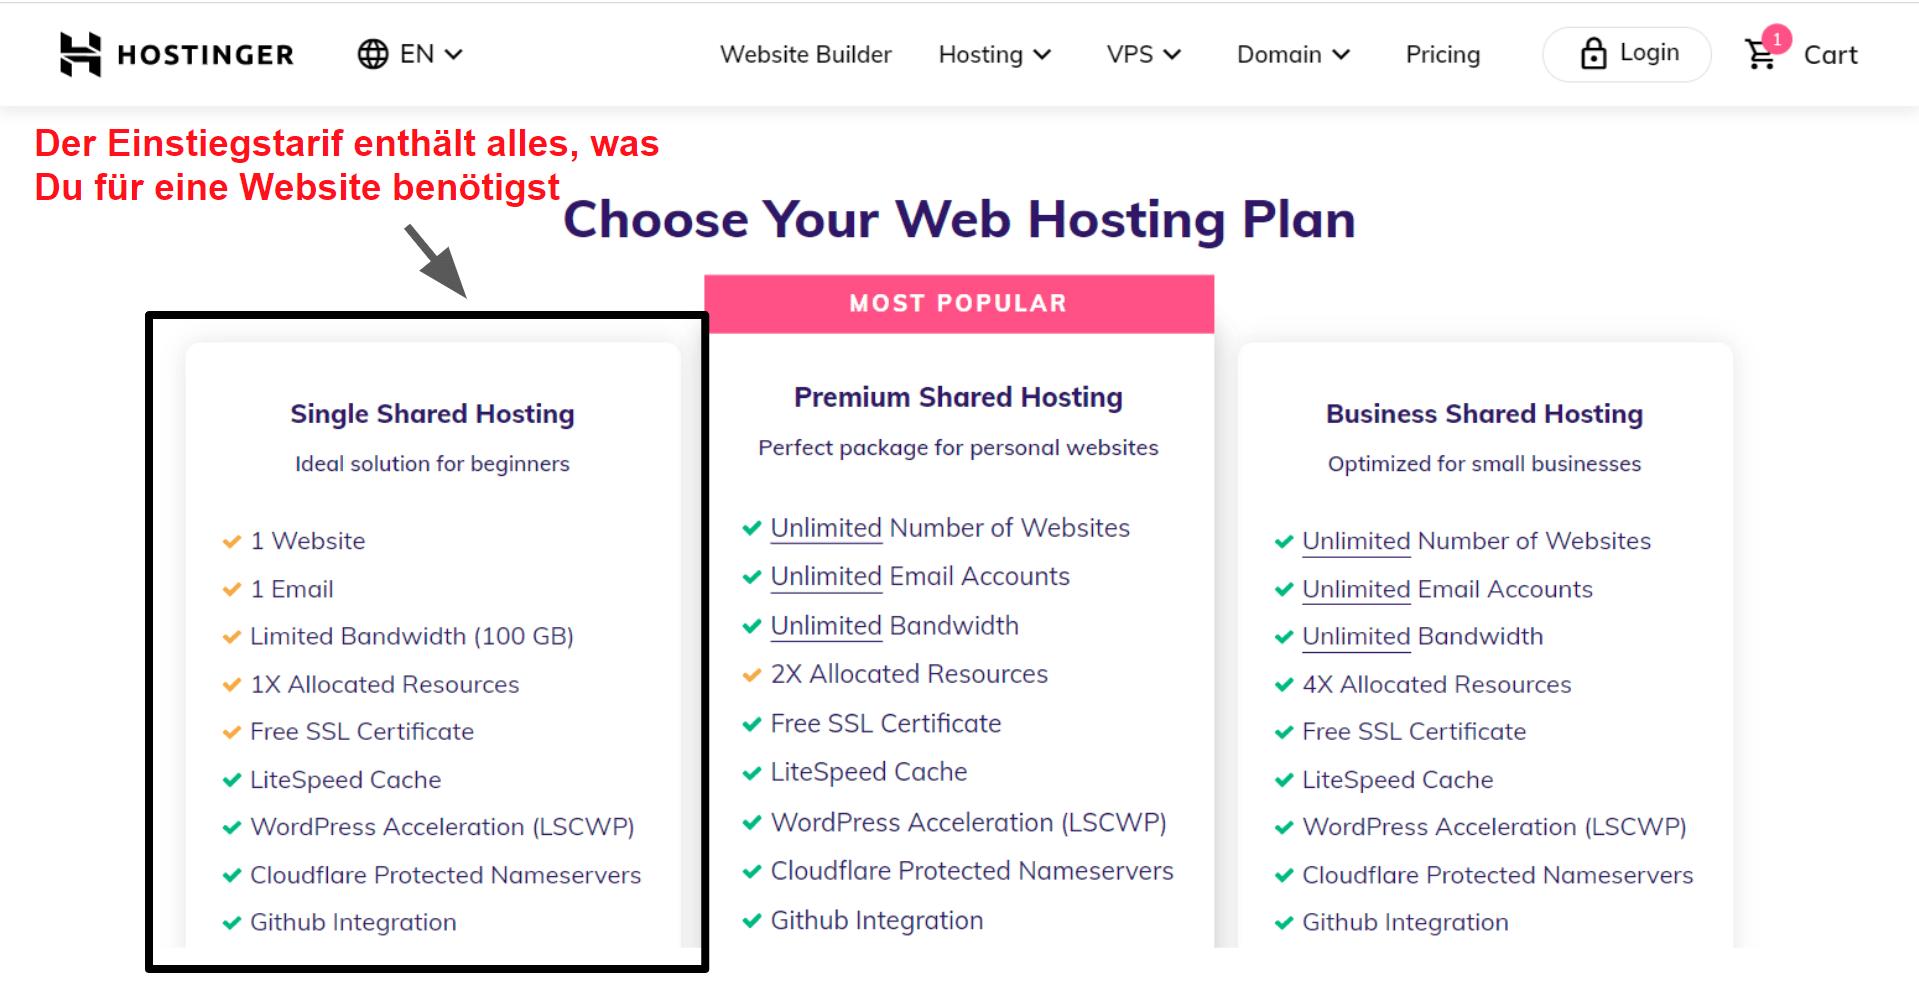 hosting plan features_DE